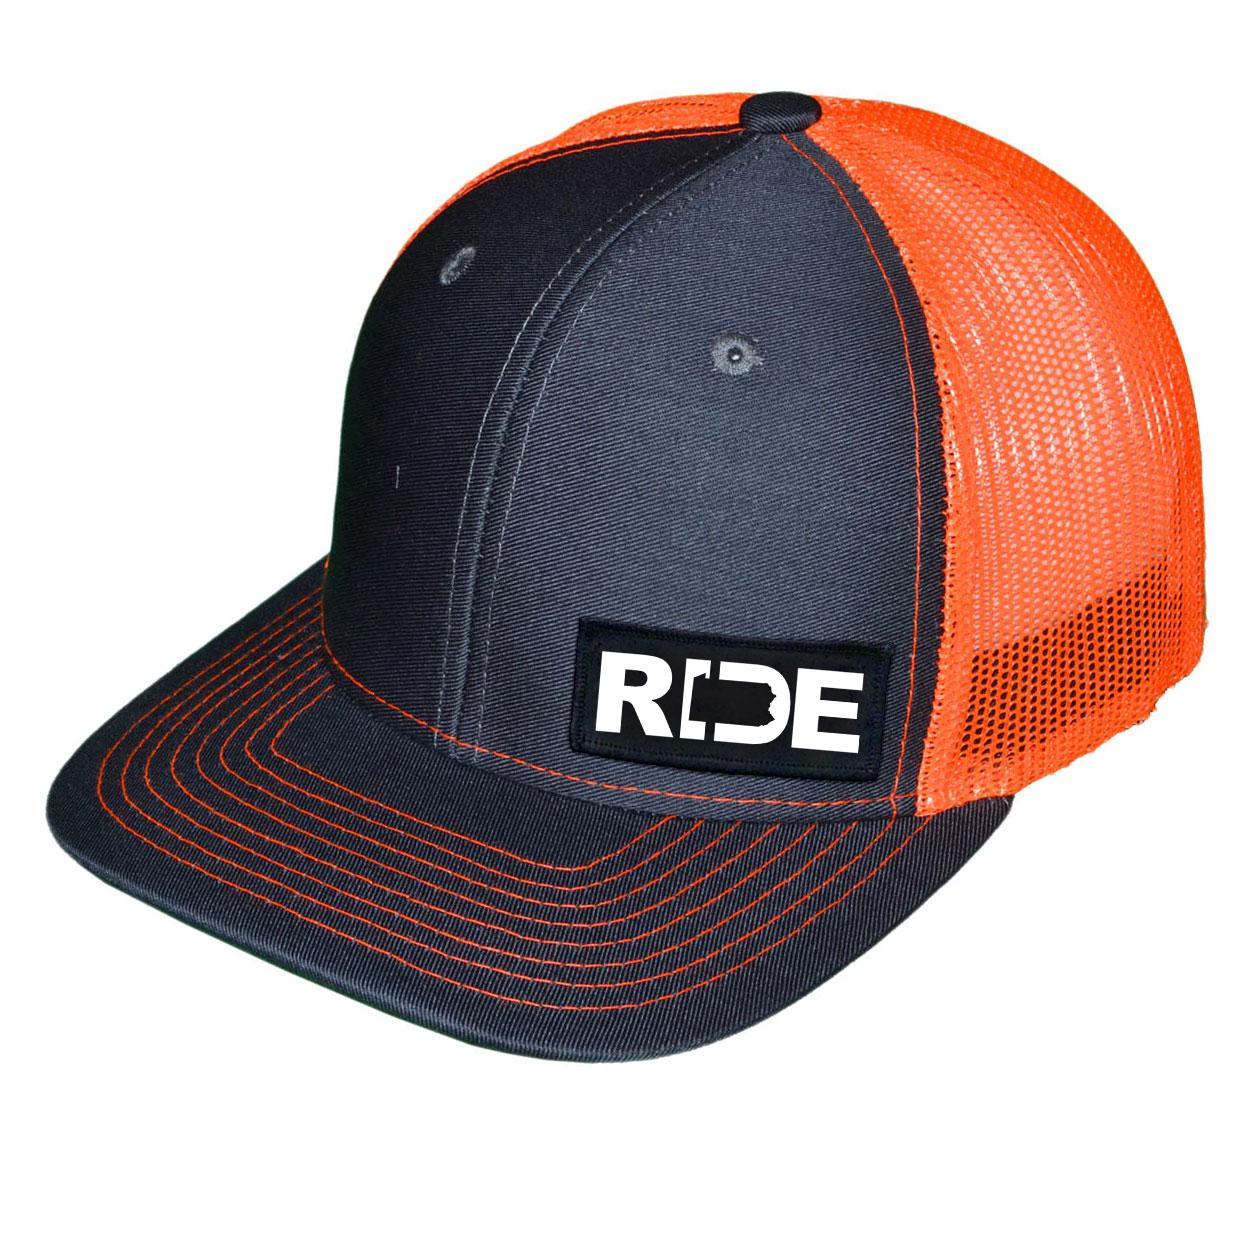 Ride Pennsylvania Night Out Woven Patch Snapback Trucker Hat Dark Gray/Orange (White Logo)